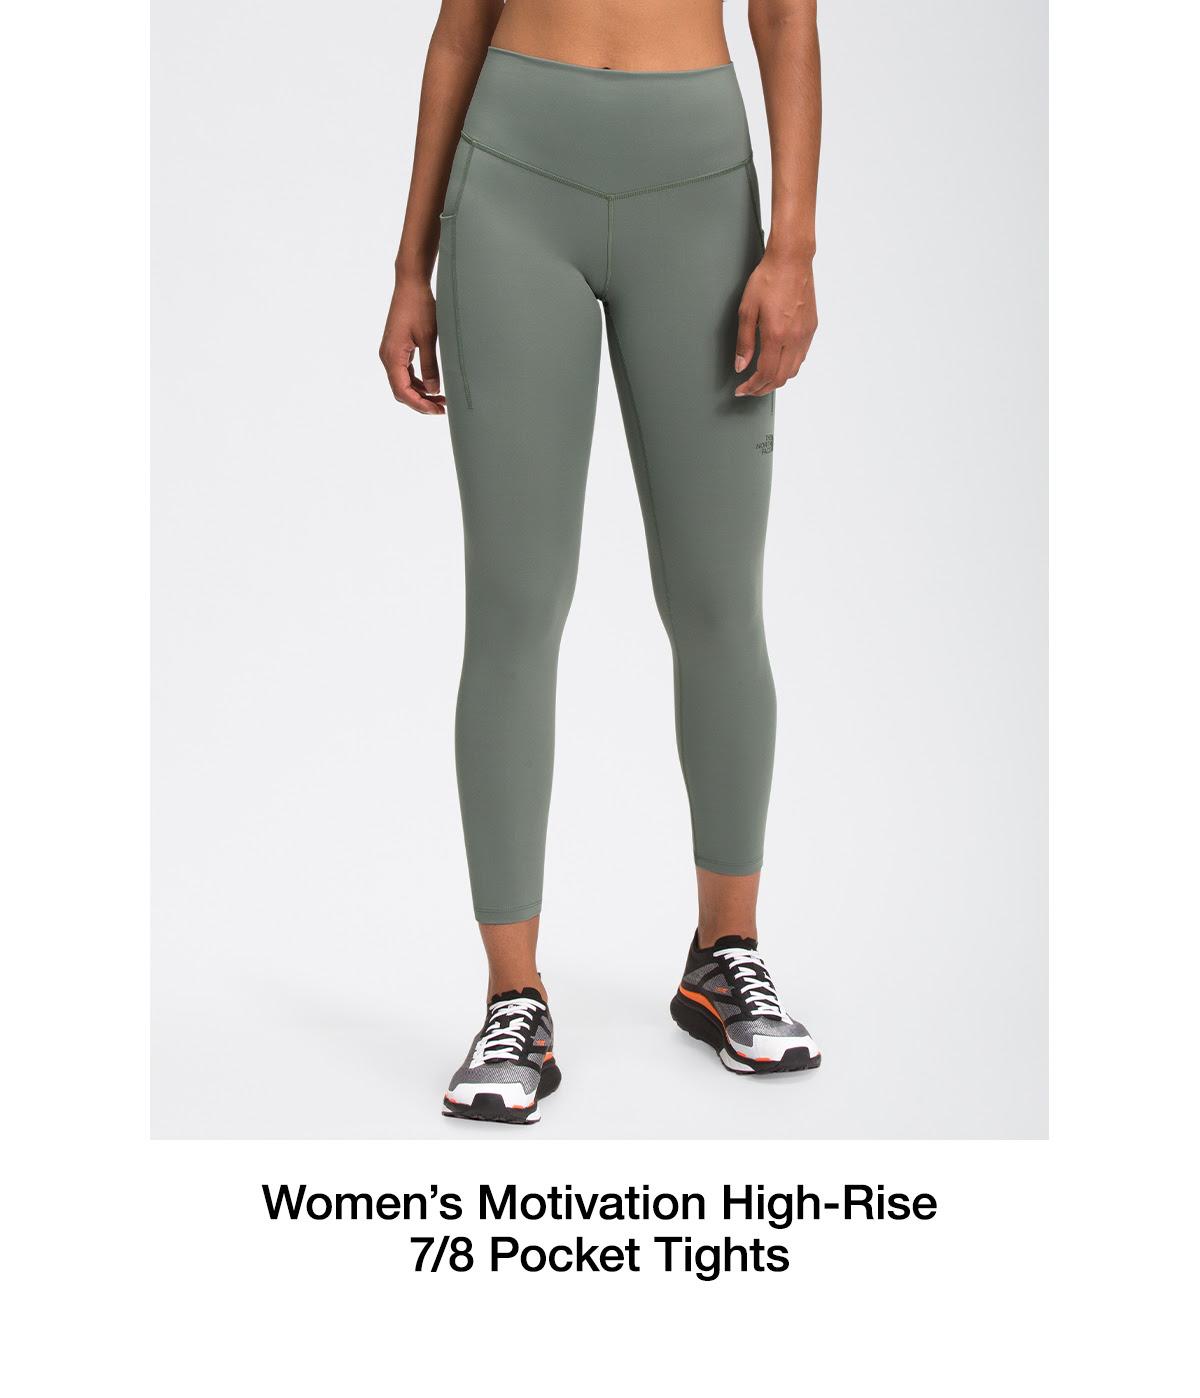 Women's Motivation High-Rise 7/8 Pocket Tights